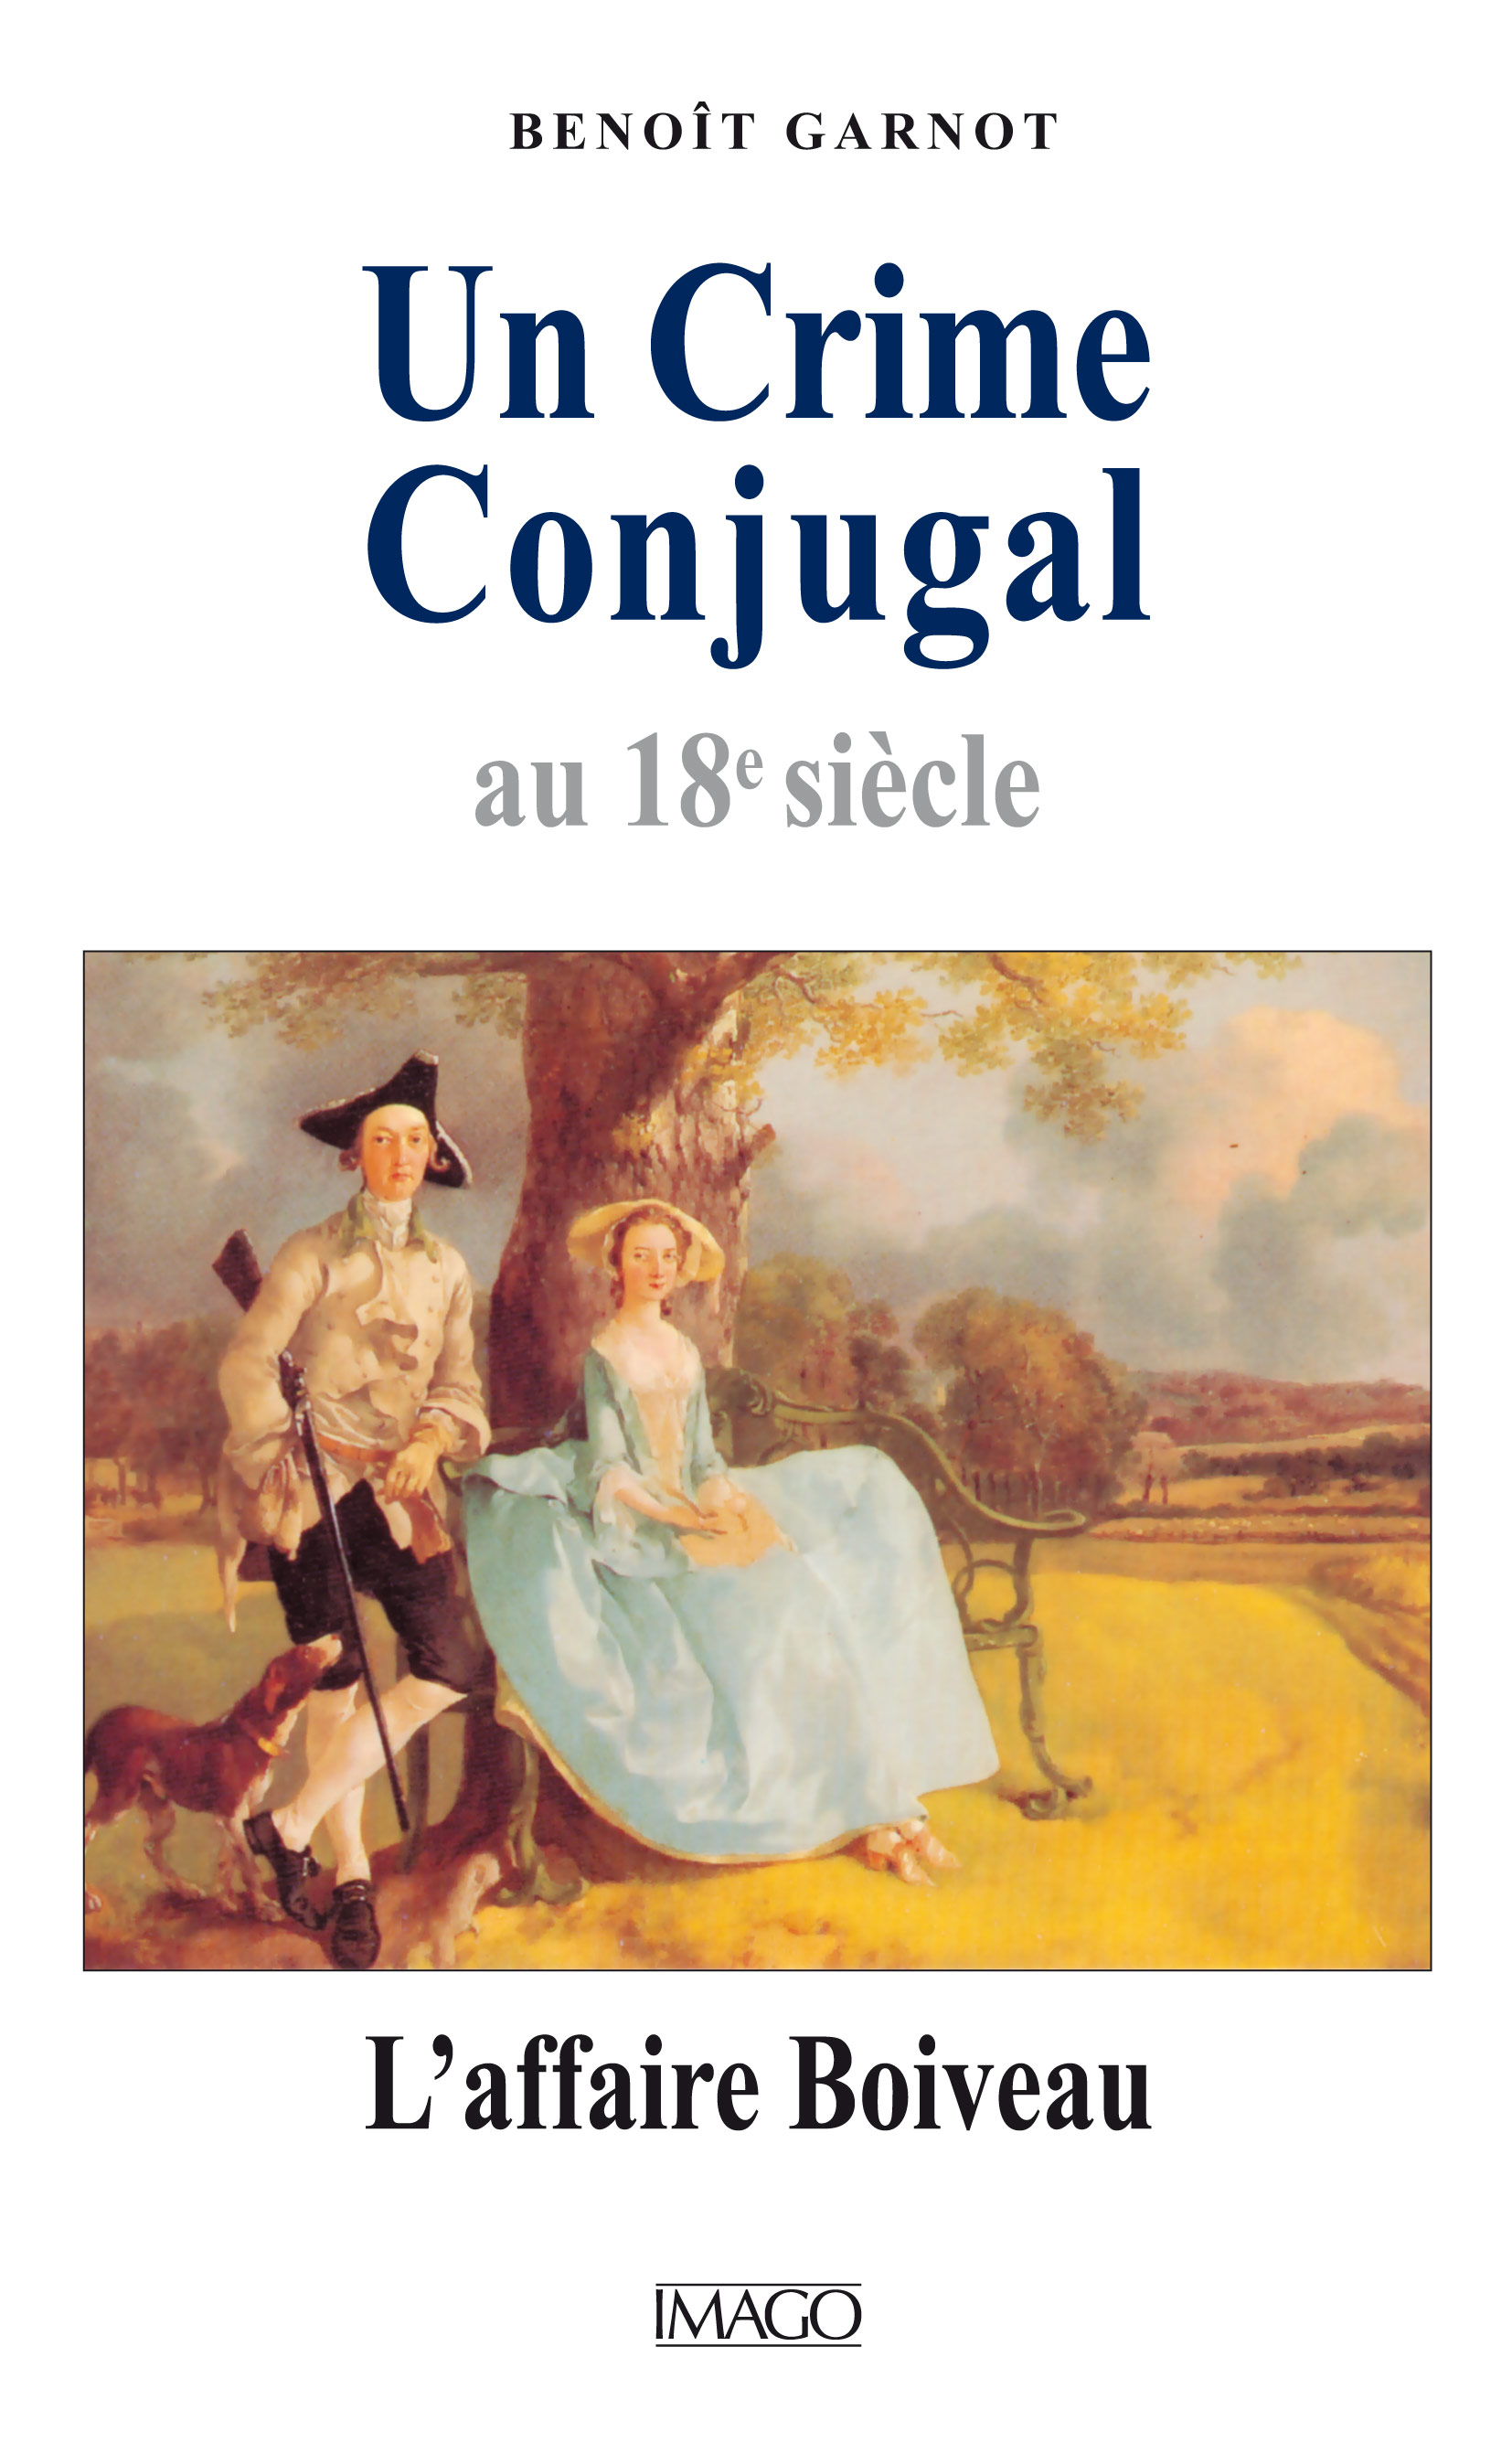 Un Crime conjugal au 18e siècle